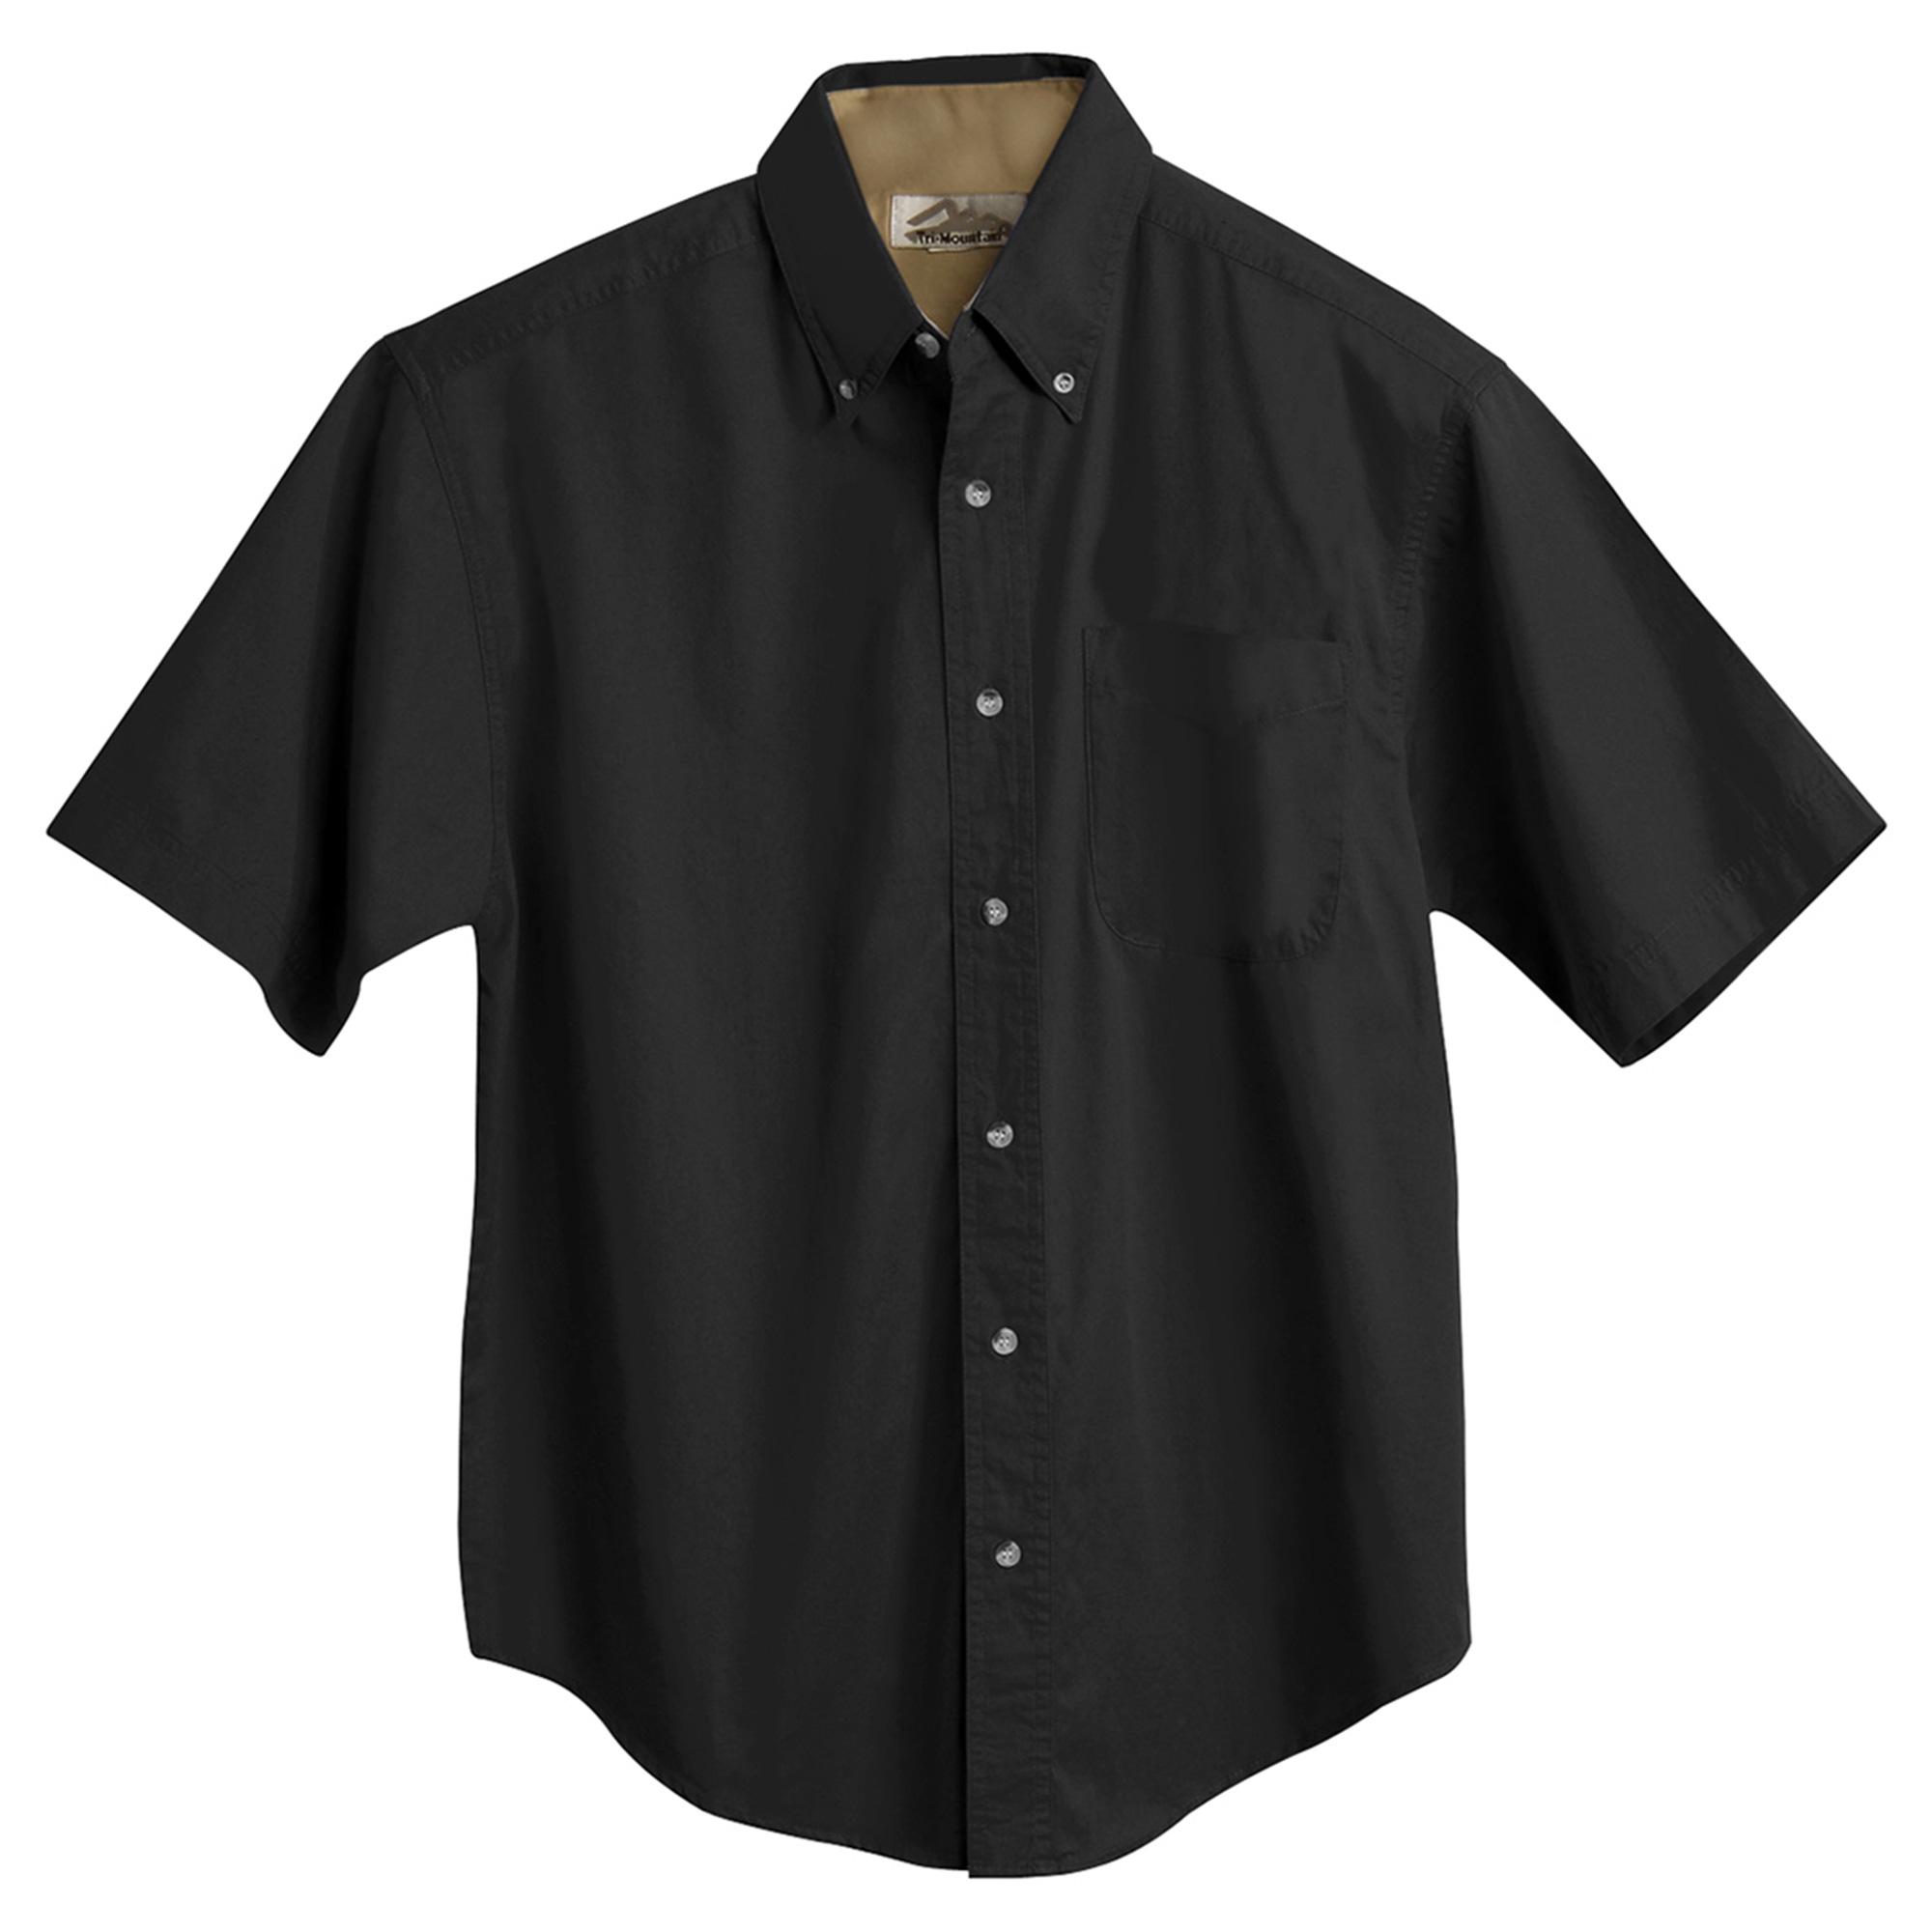 Tri-Mountain Men's Big And Tall Woven Shirt